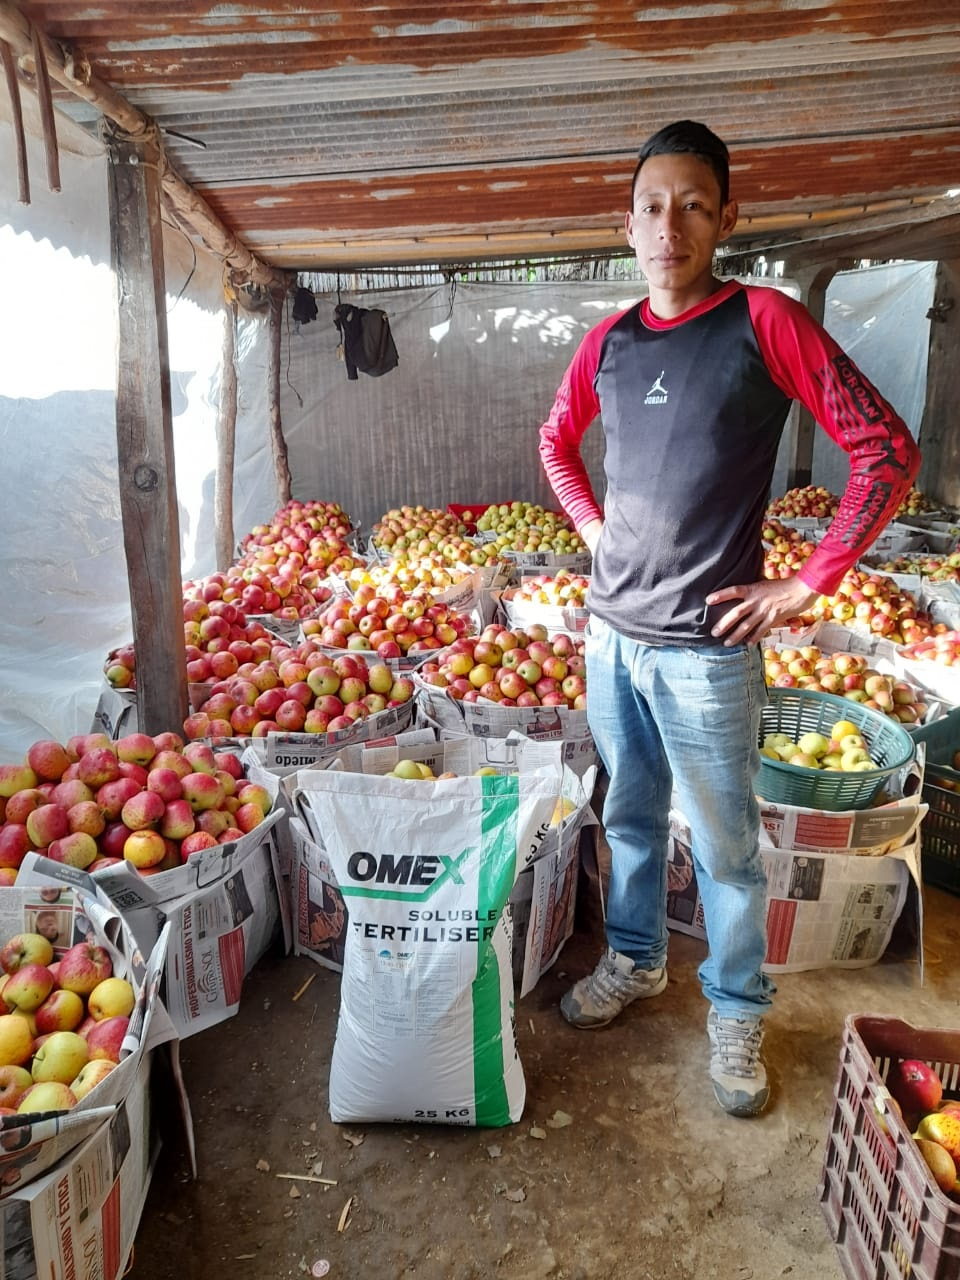 Apples grower Guatemala